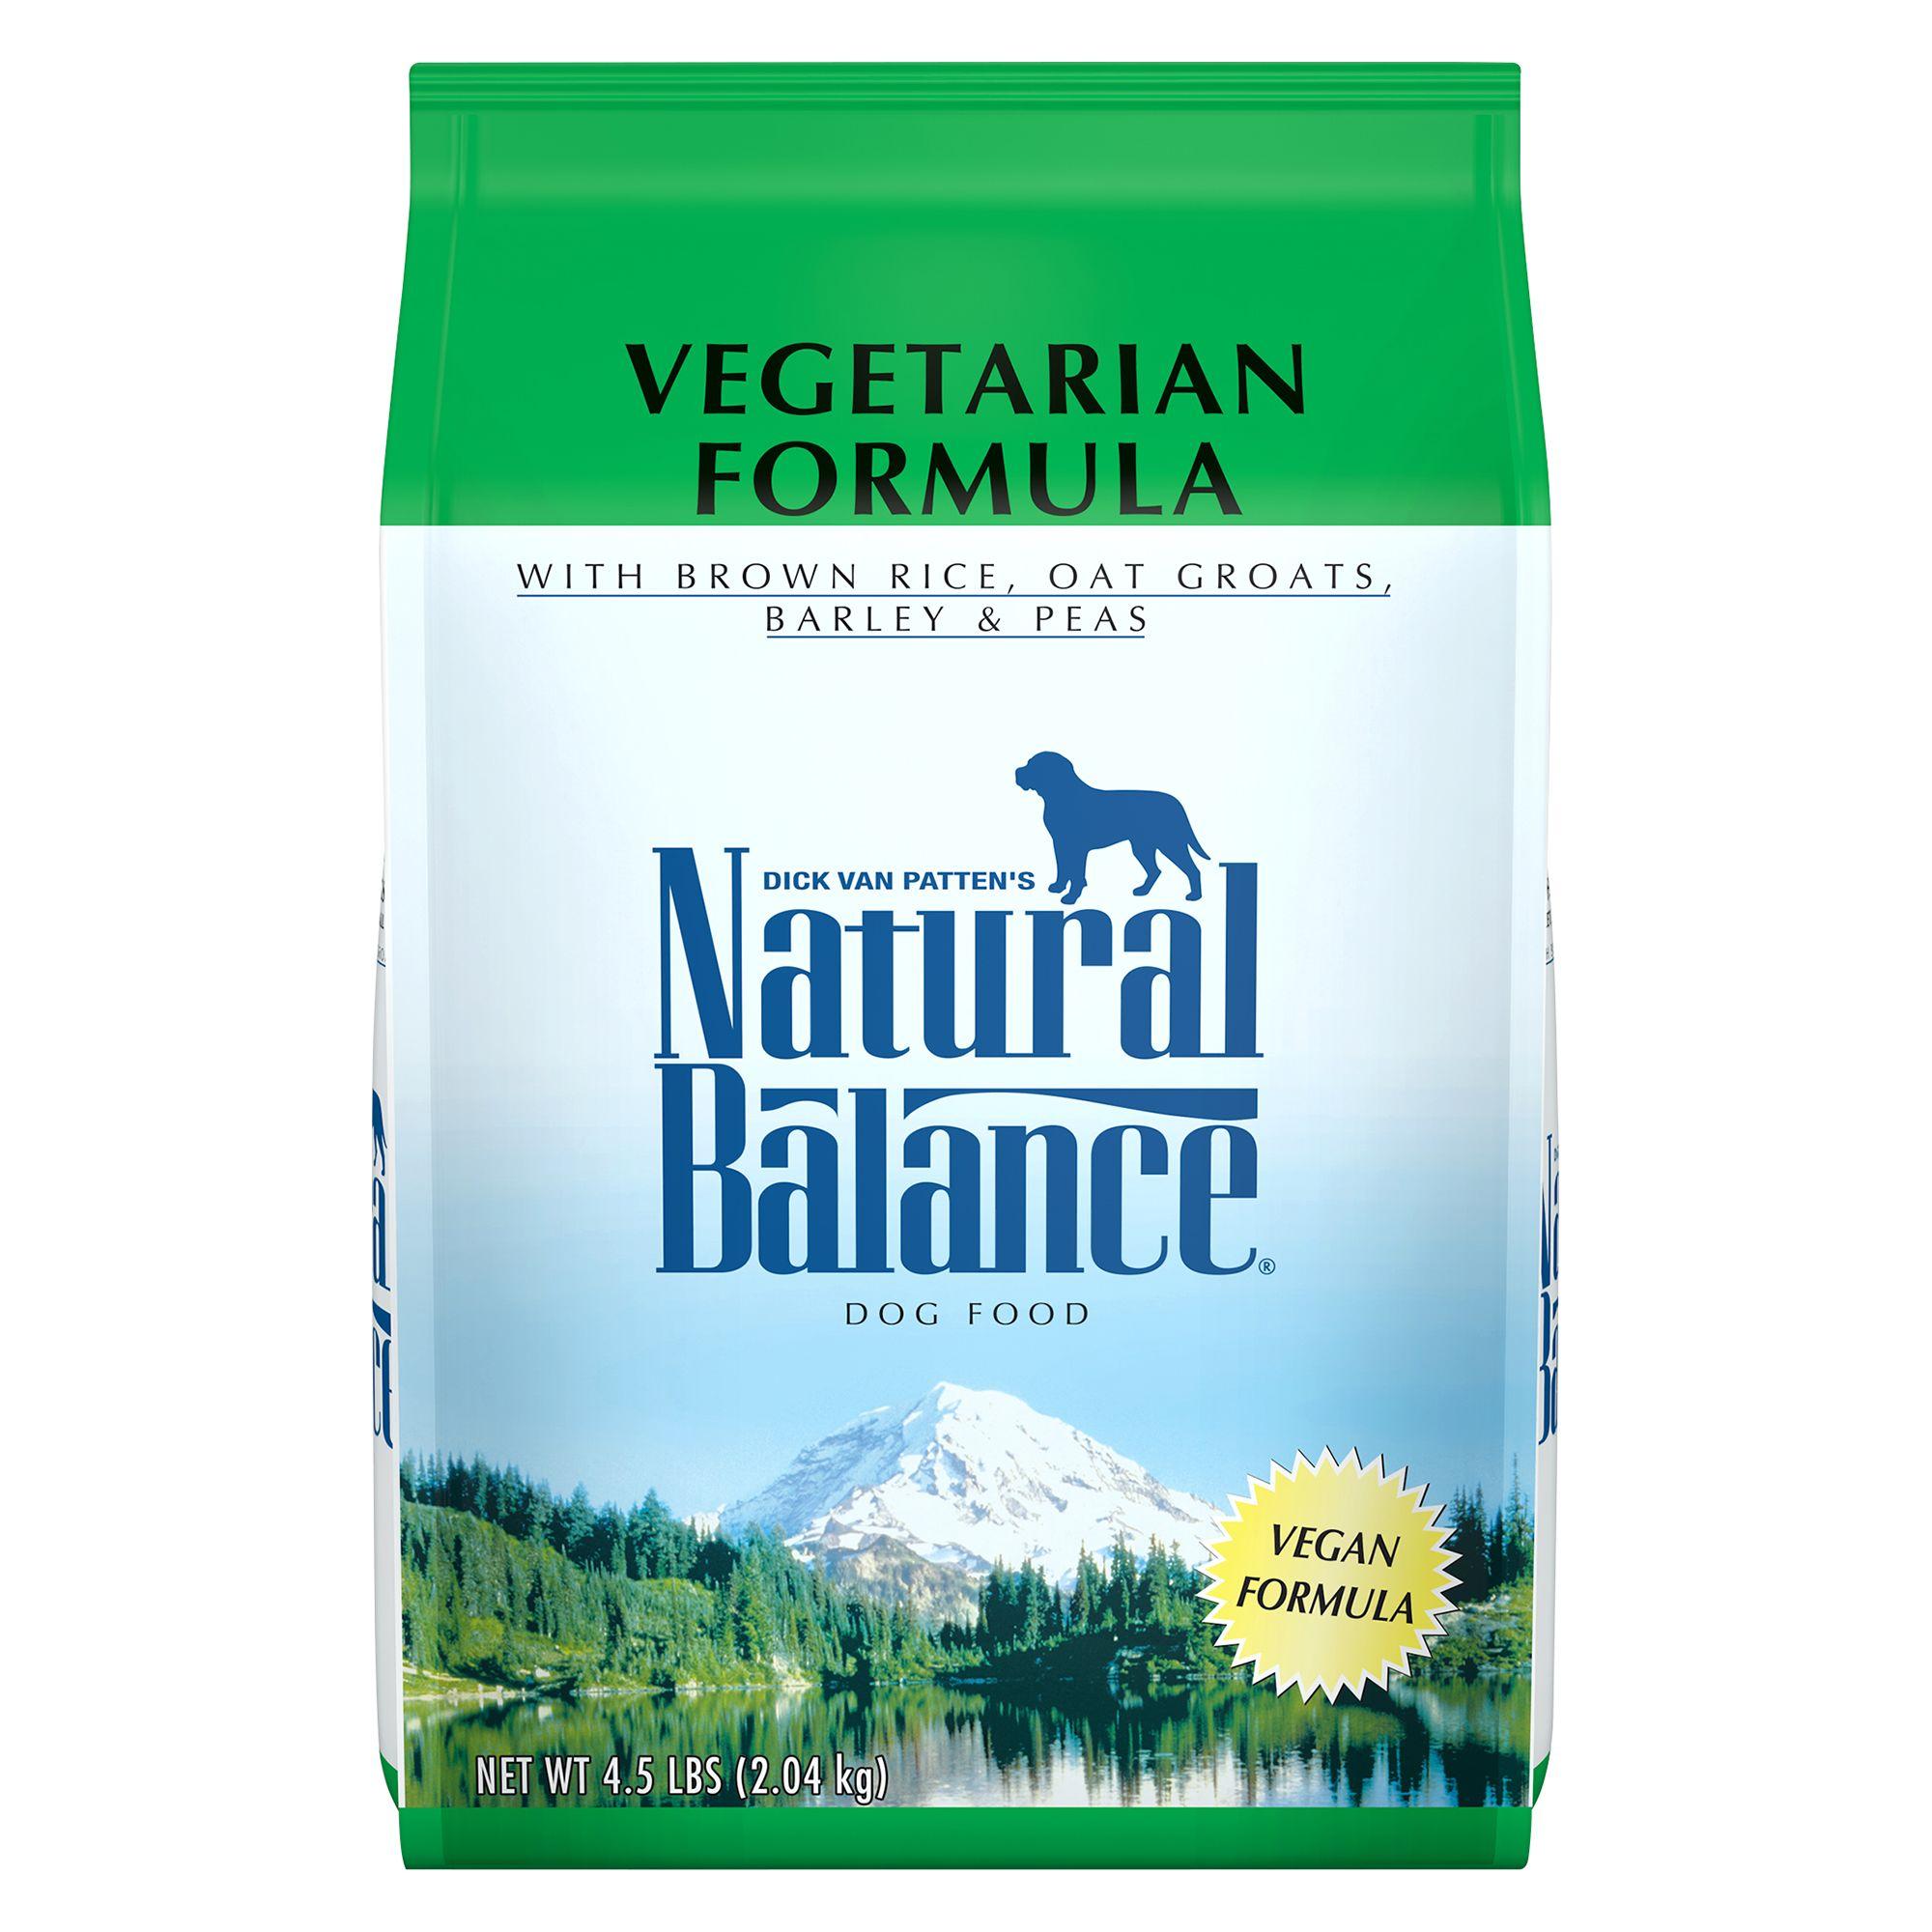 Ordinary Balance Dog Food - Vegetarian, Vegan size: 4.5 Lb, Brown Rice, Kibble, All Life Stages